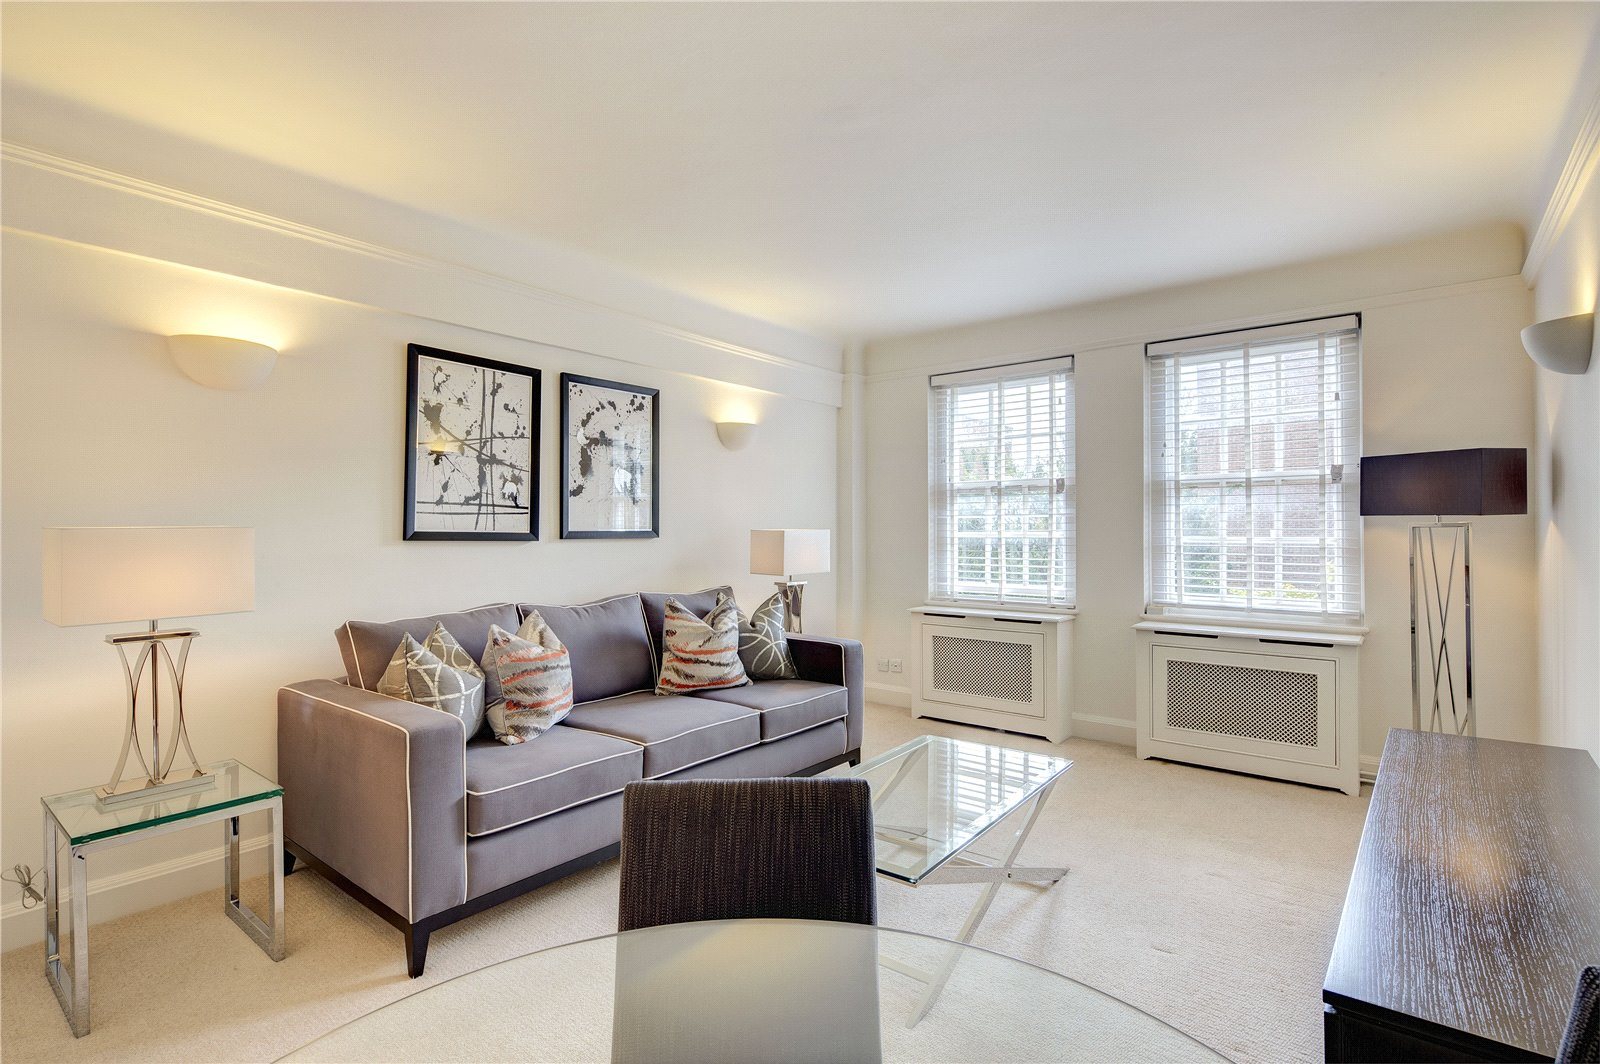 Apartment for Rent at Pelham Court, 145 Fulham Road, Fulham, London, SW3 Pelham Court, 145 Fulham Road, Fulham, London, SW3